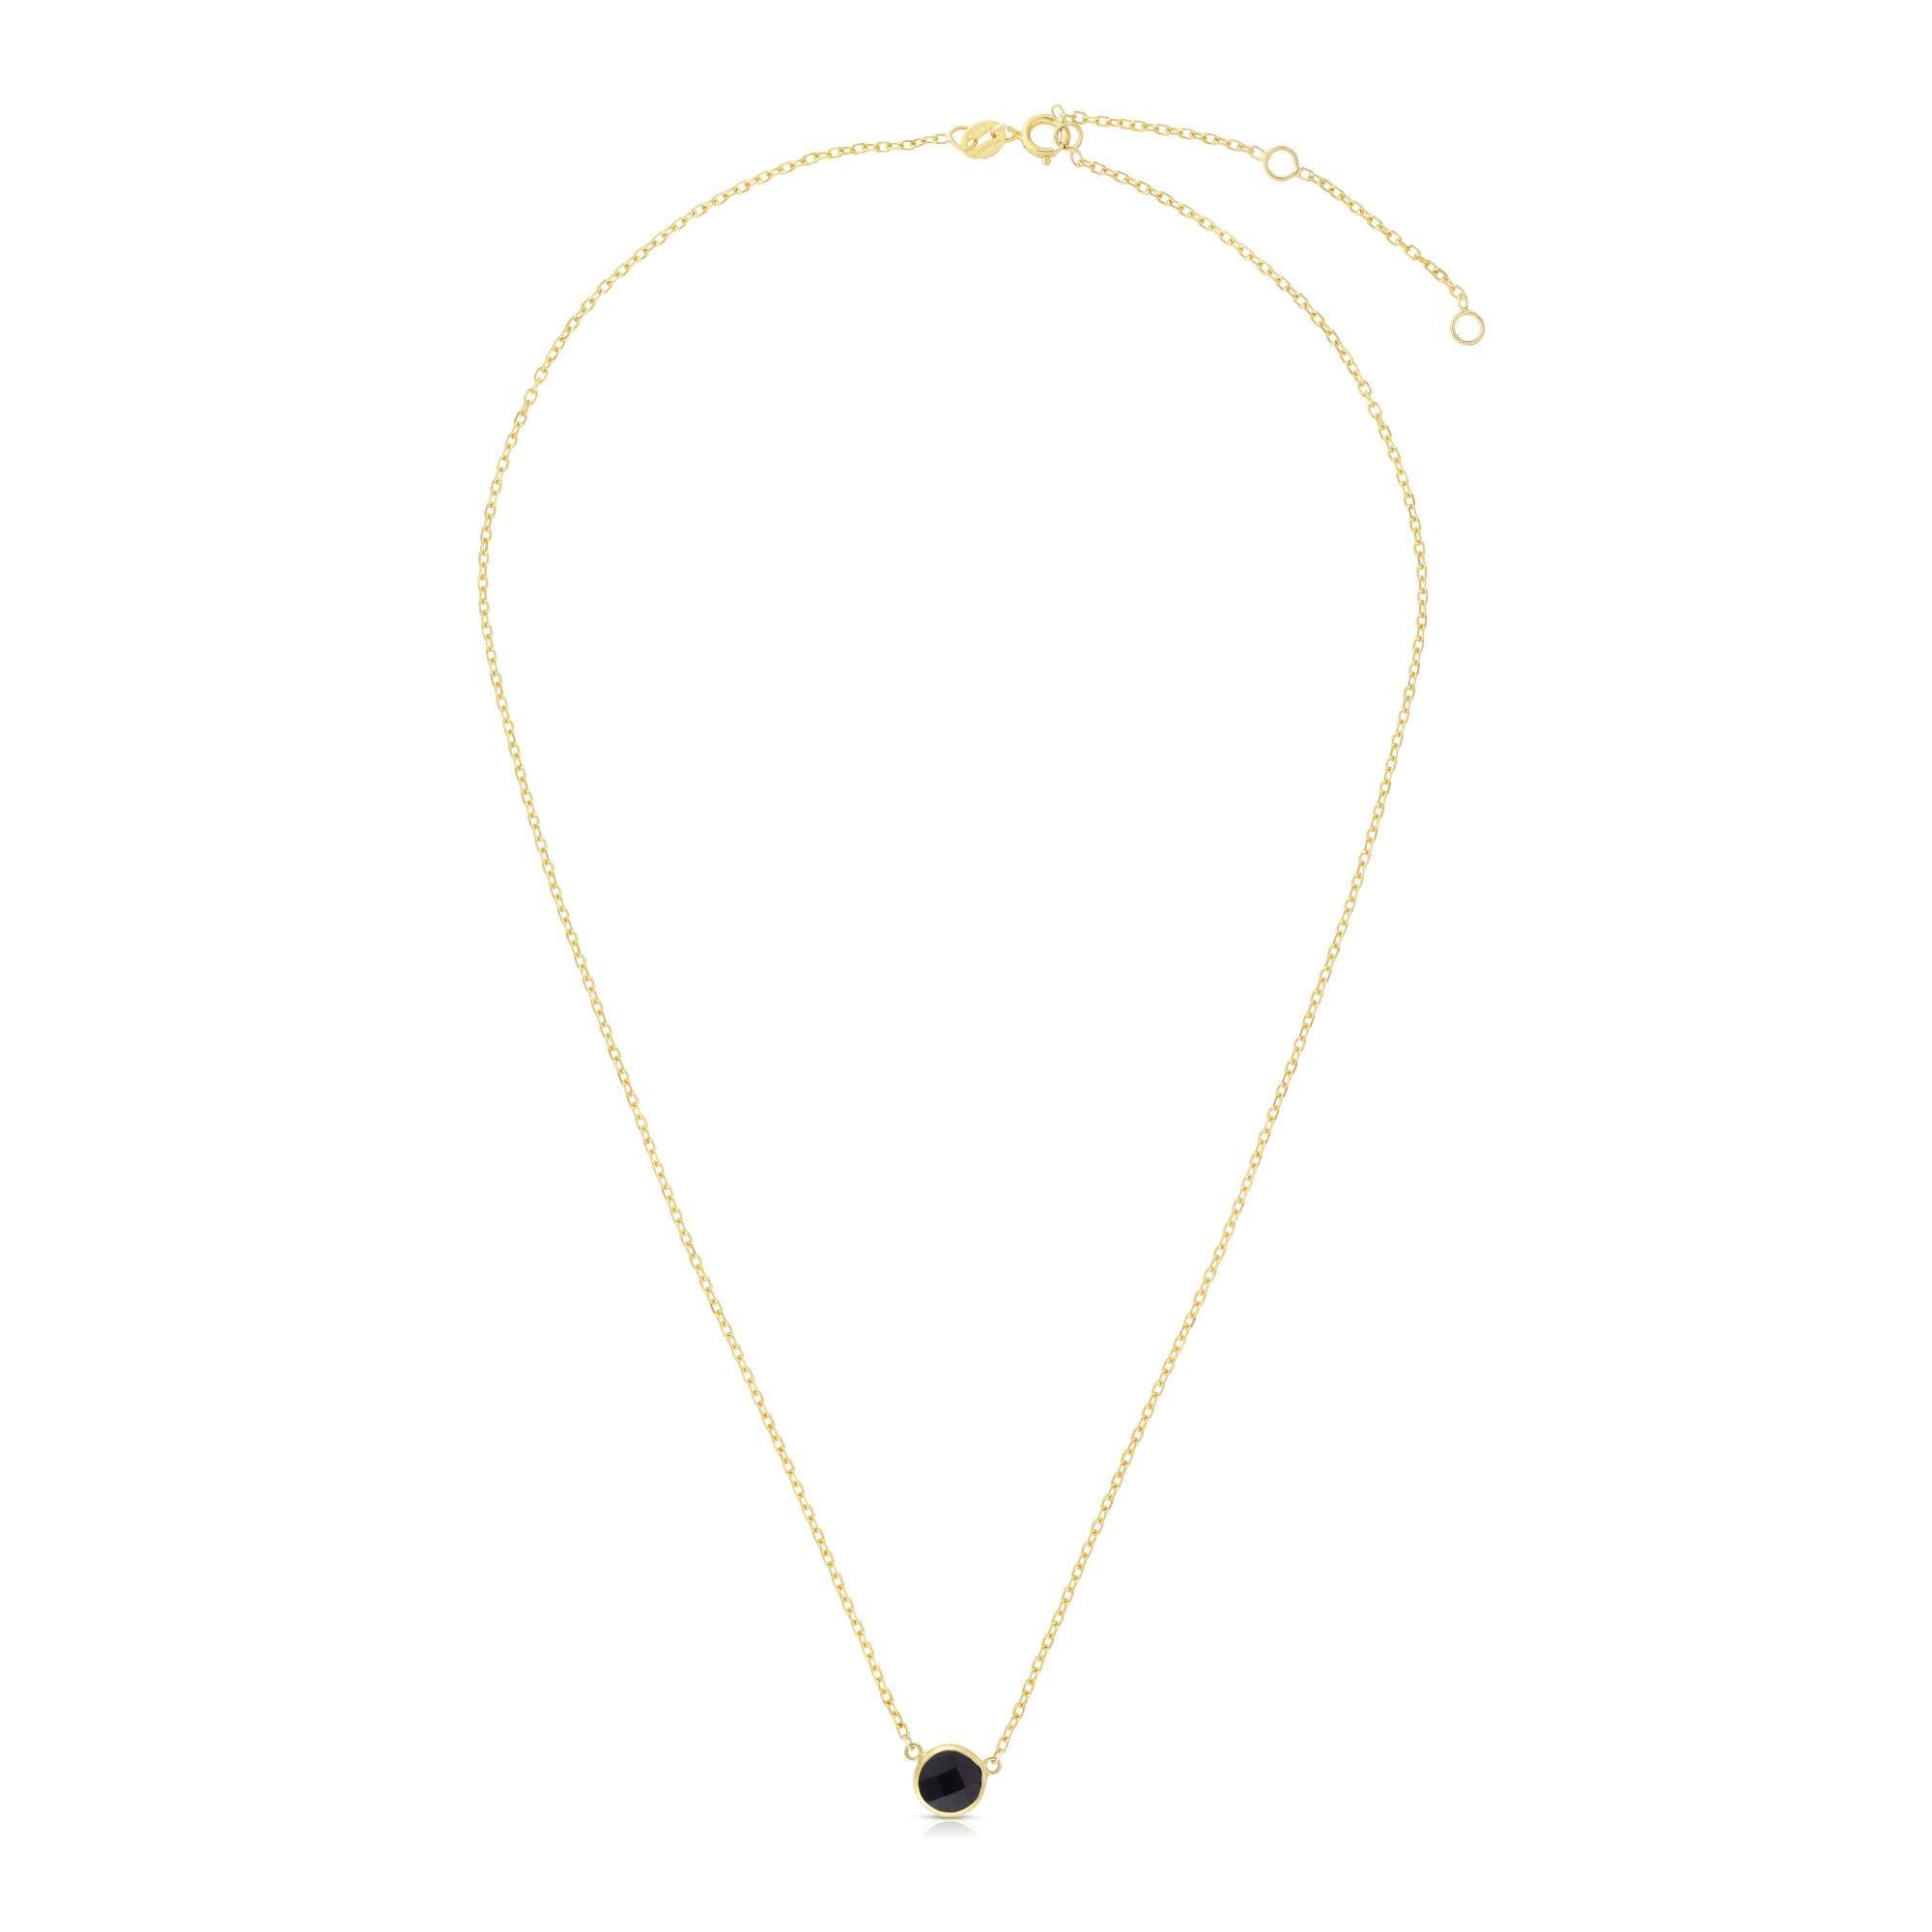 Black Onyx Round Necklace 17